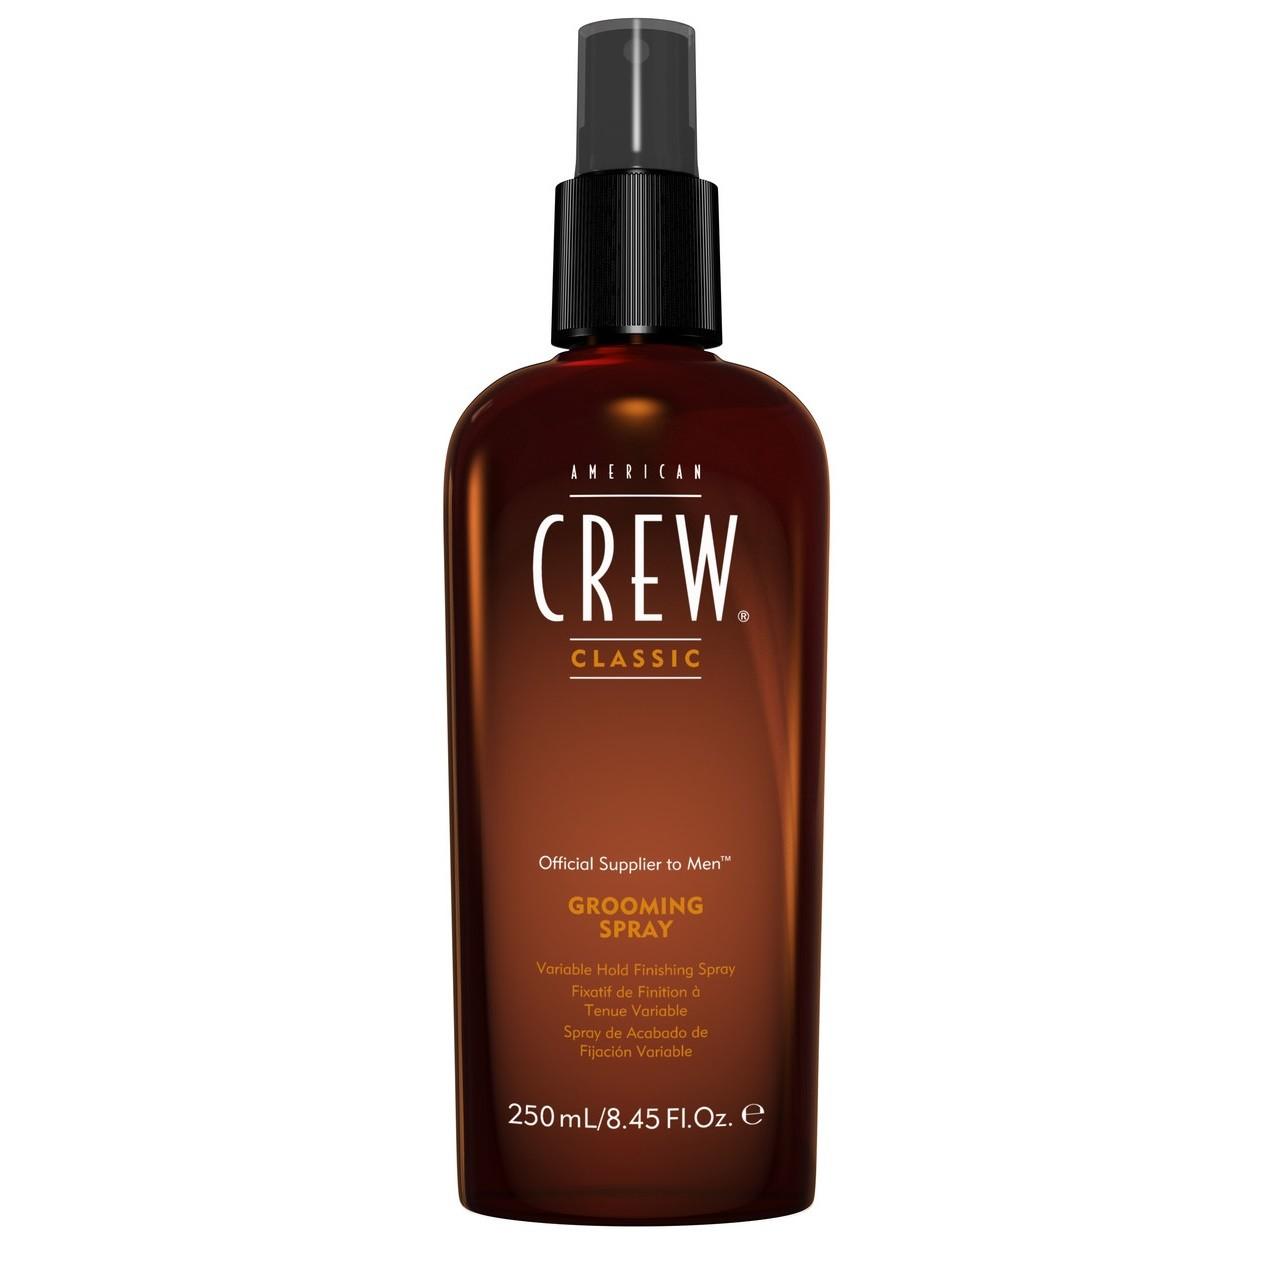 Спрей для волос American Crew Grooming Spray средней фиксации 250 мл